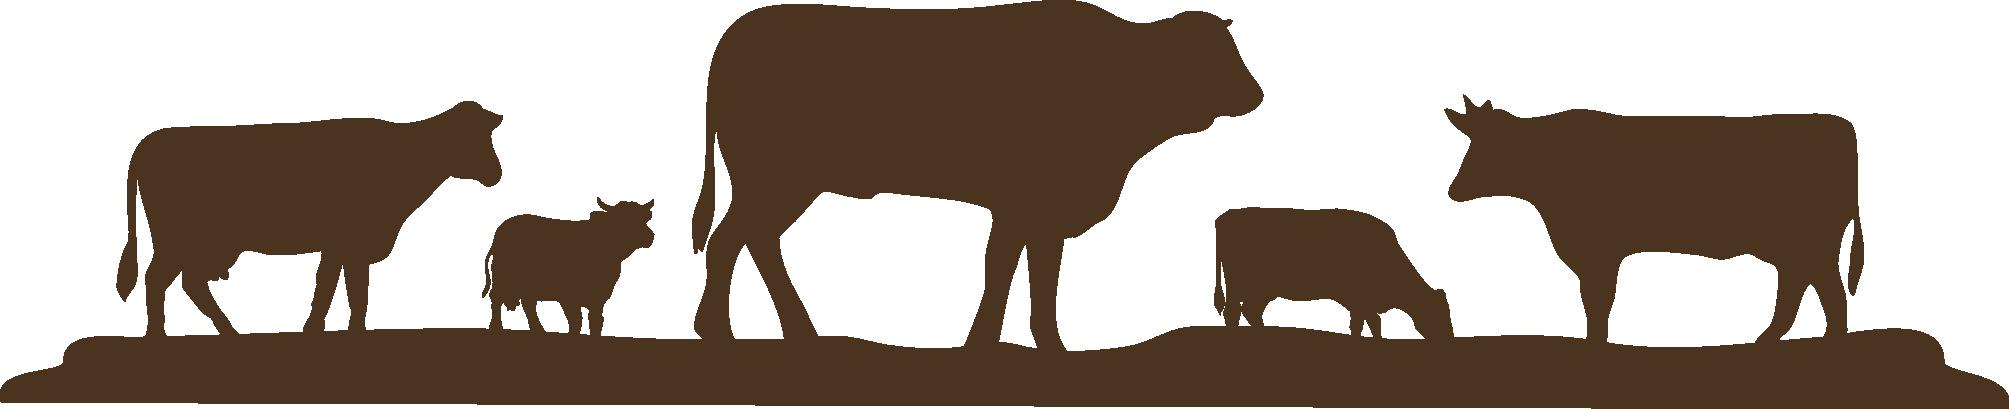 Clipart cow shadow. Farm info reese cattle